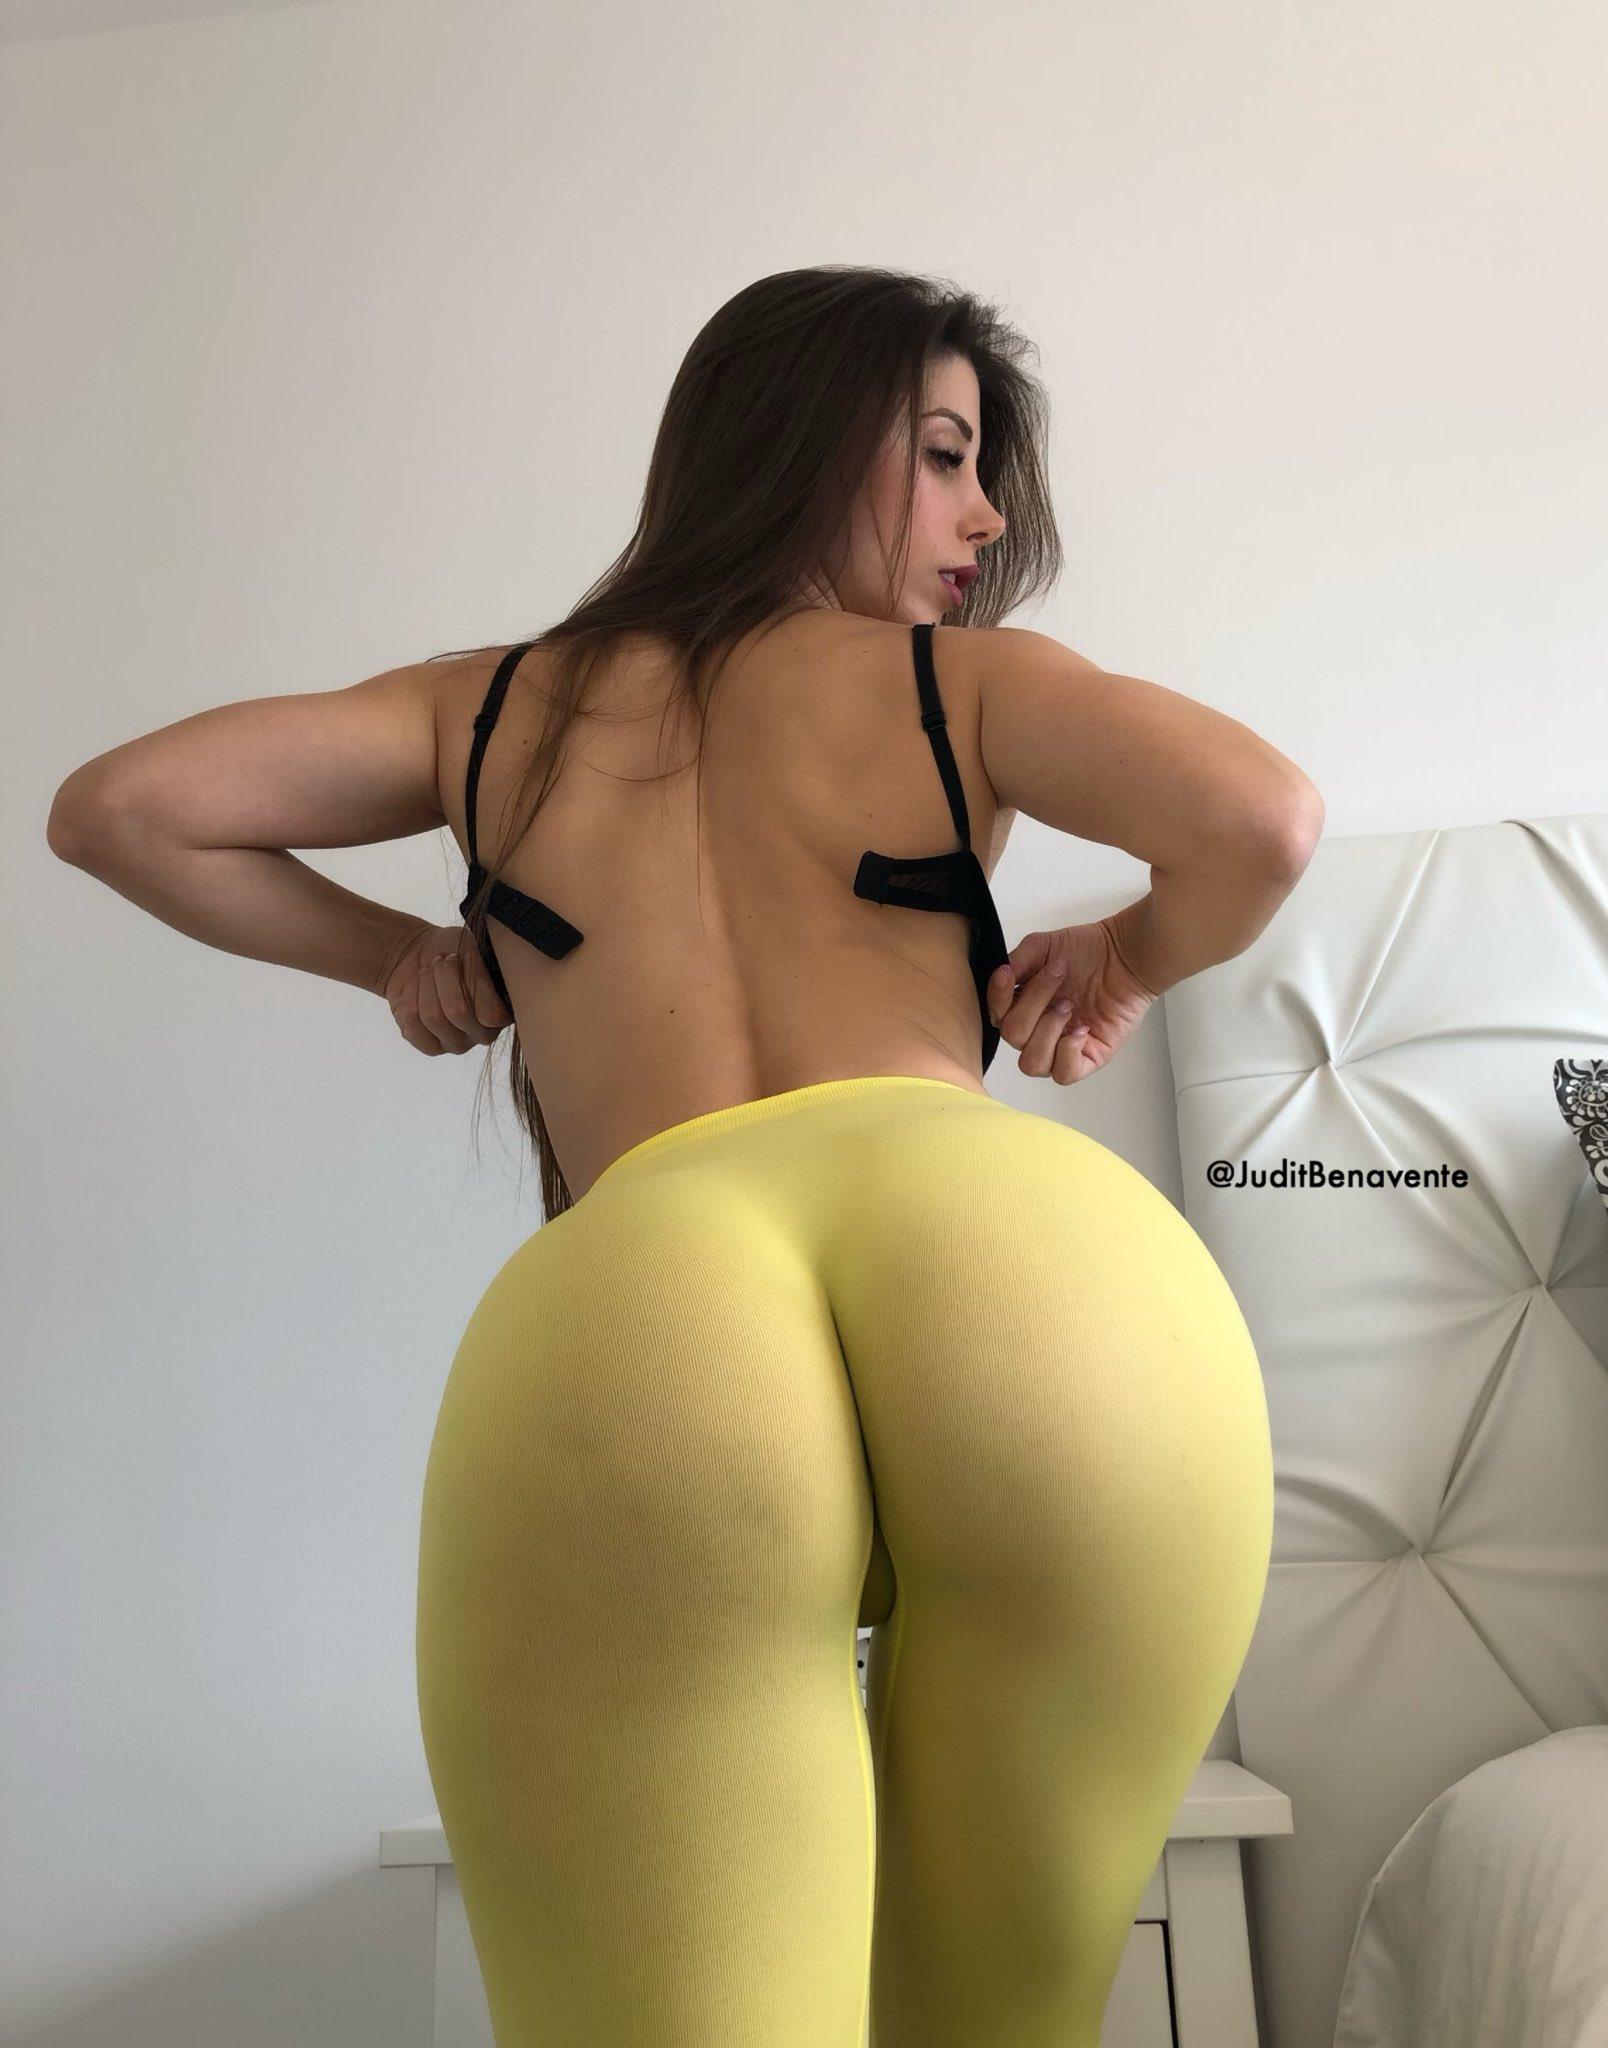 Judit Benavente Porn photo 6